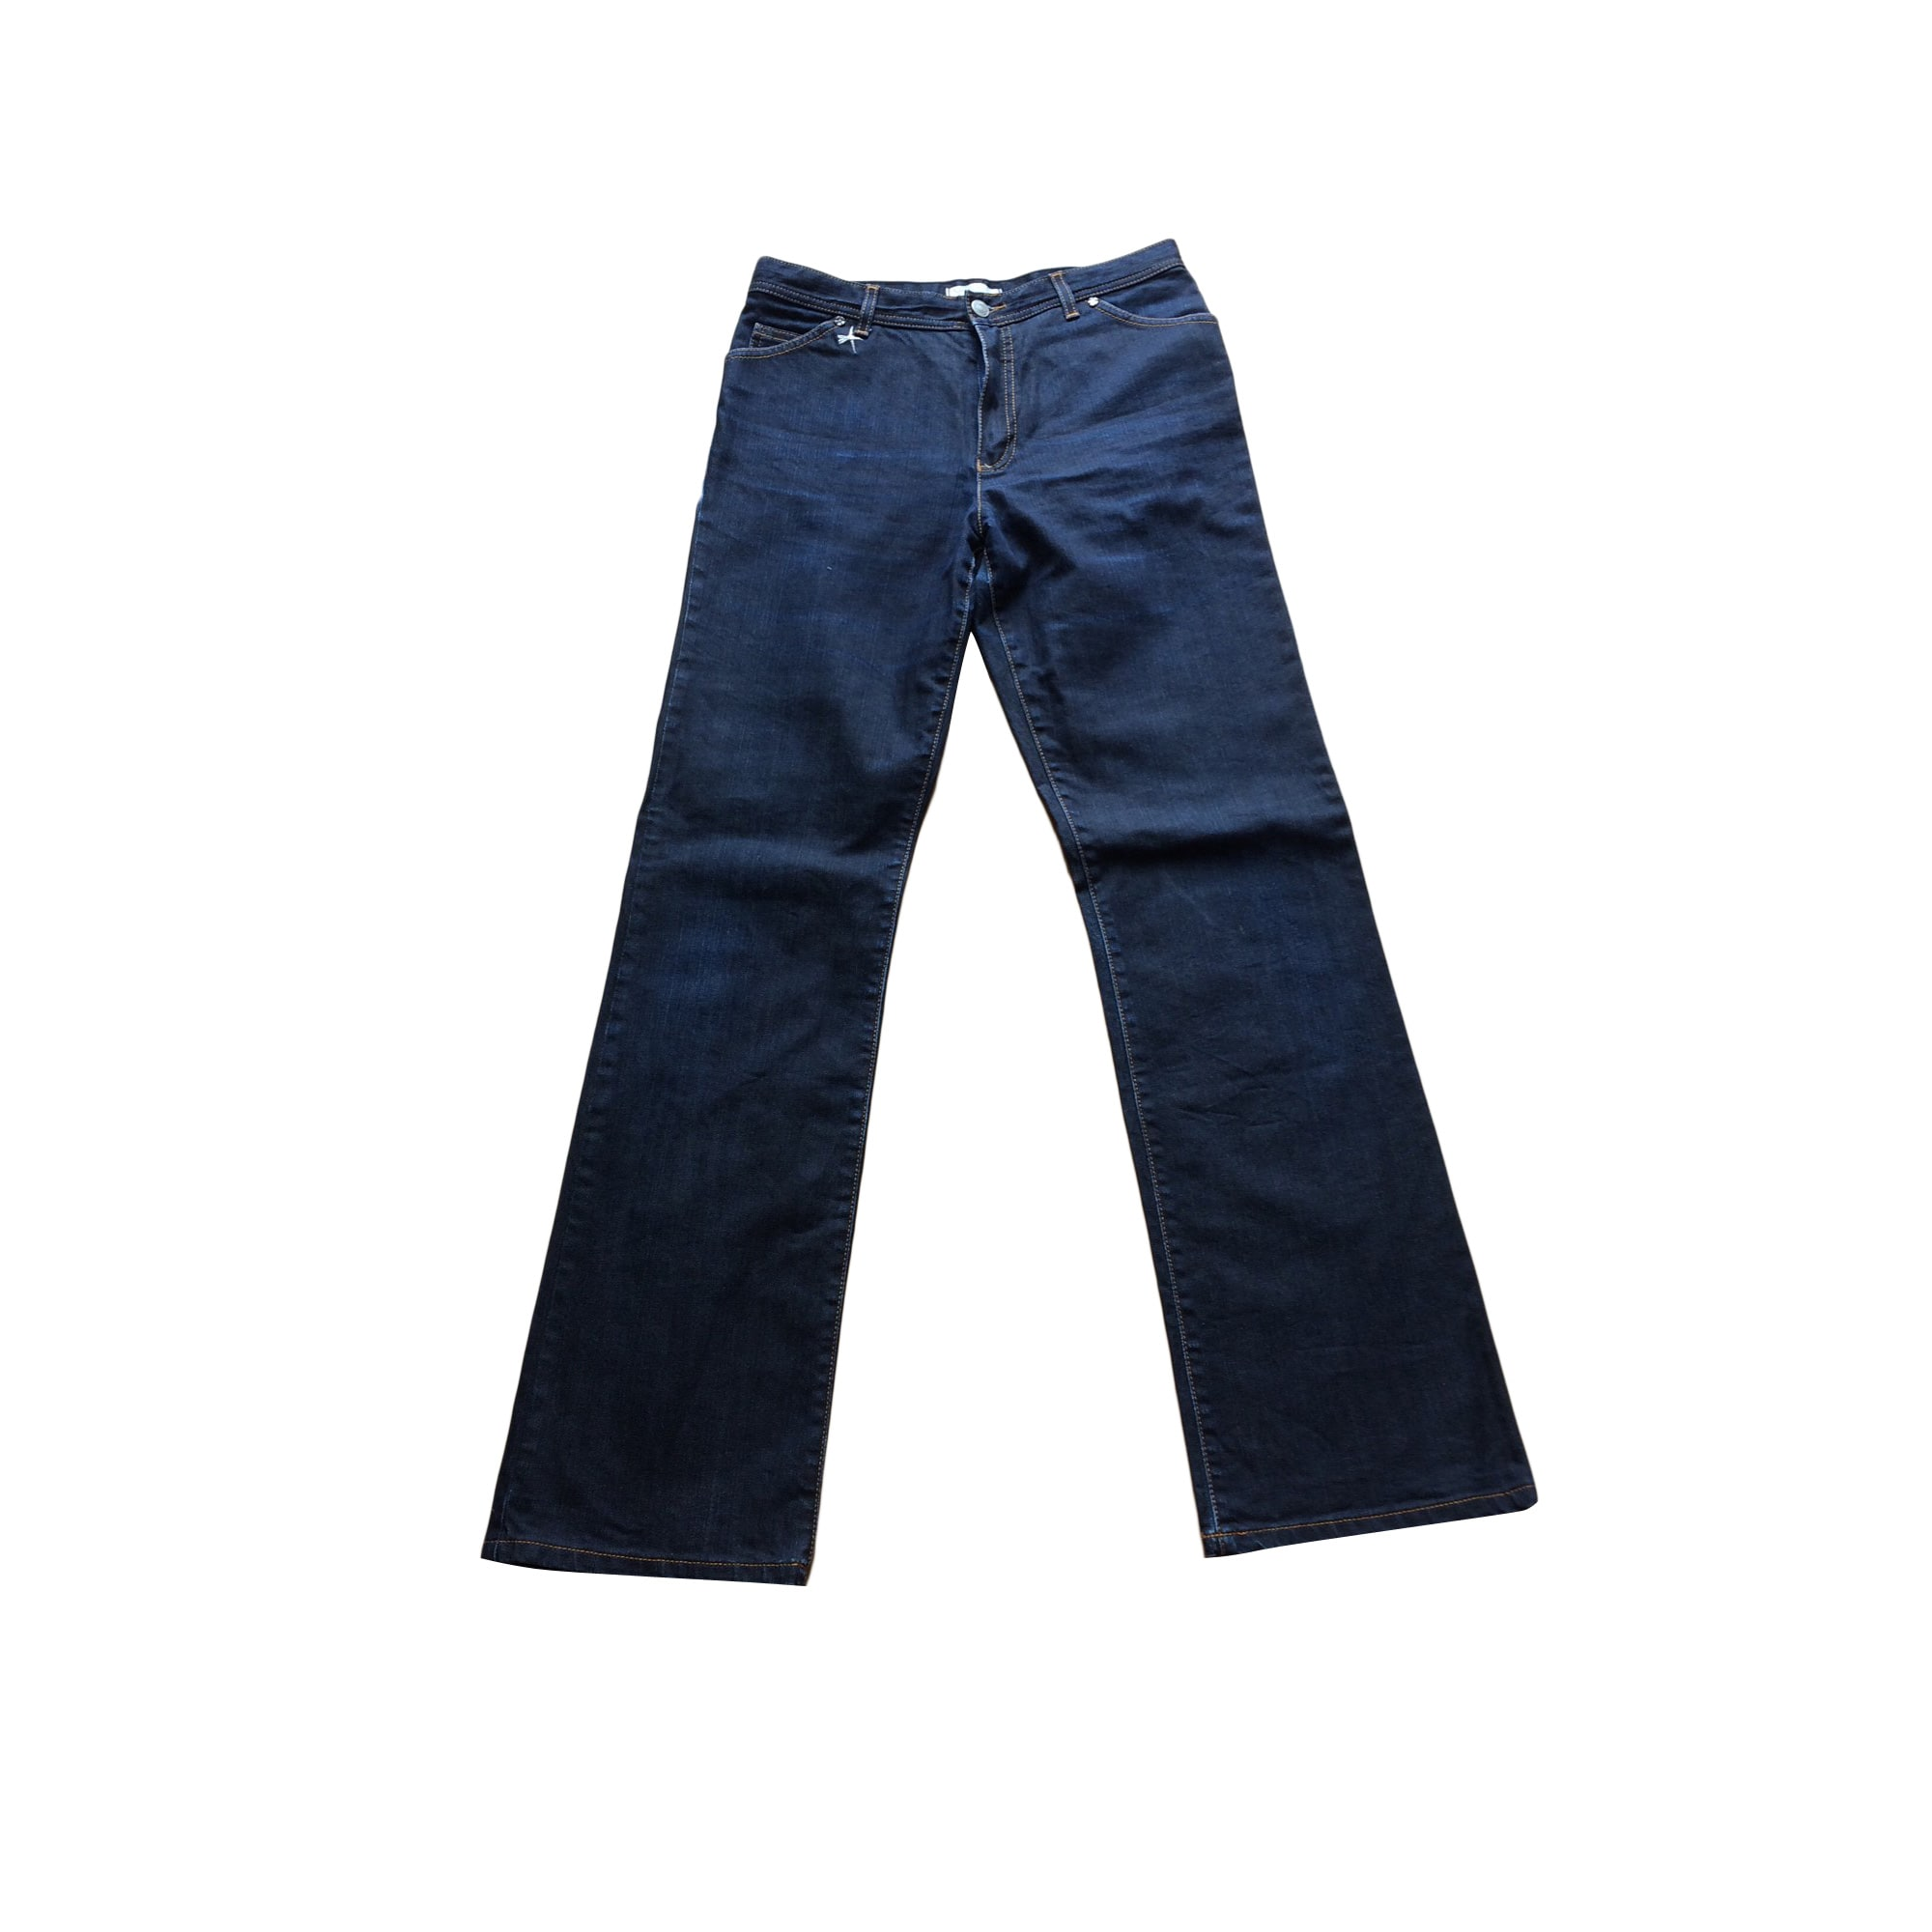 Pantalon droit ARMAND VENTILO Bleu, bleu marine, bleu turquoise